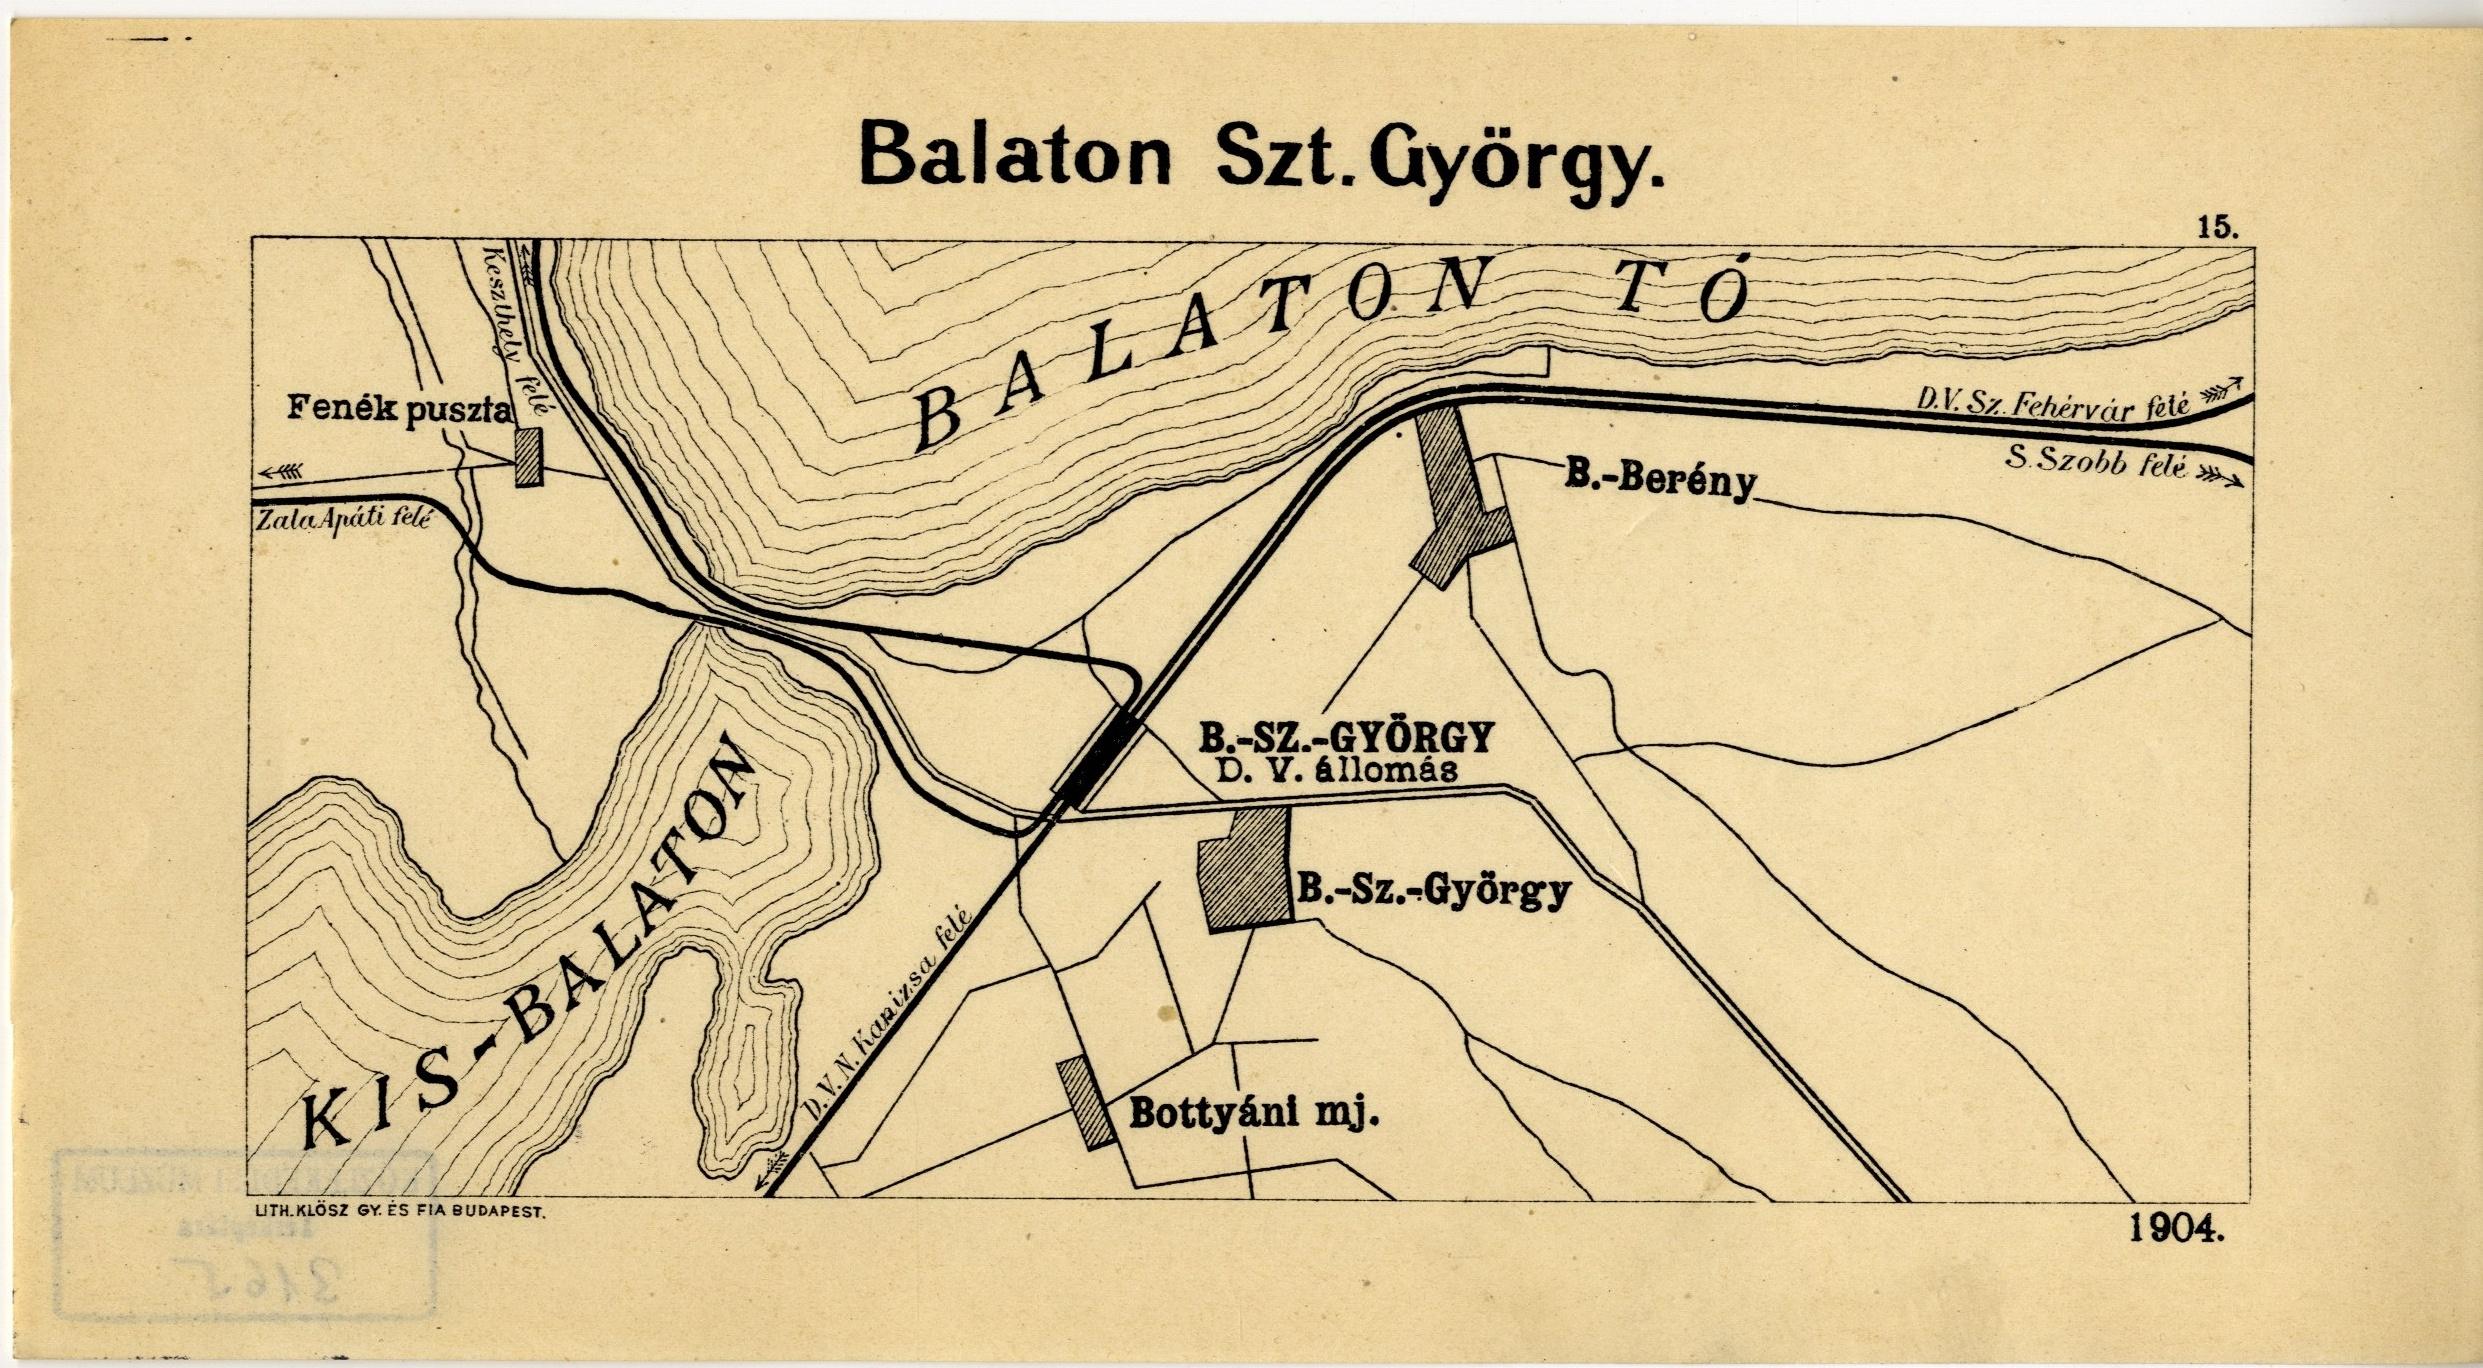 Balatonszentgyorgy Vasutallomas Kiagazasi Terkepe Magyar